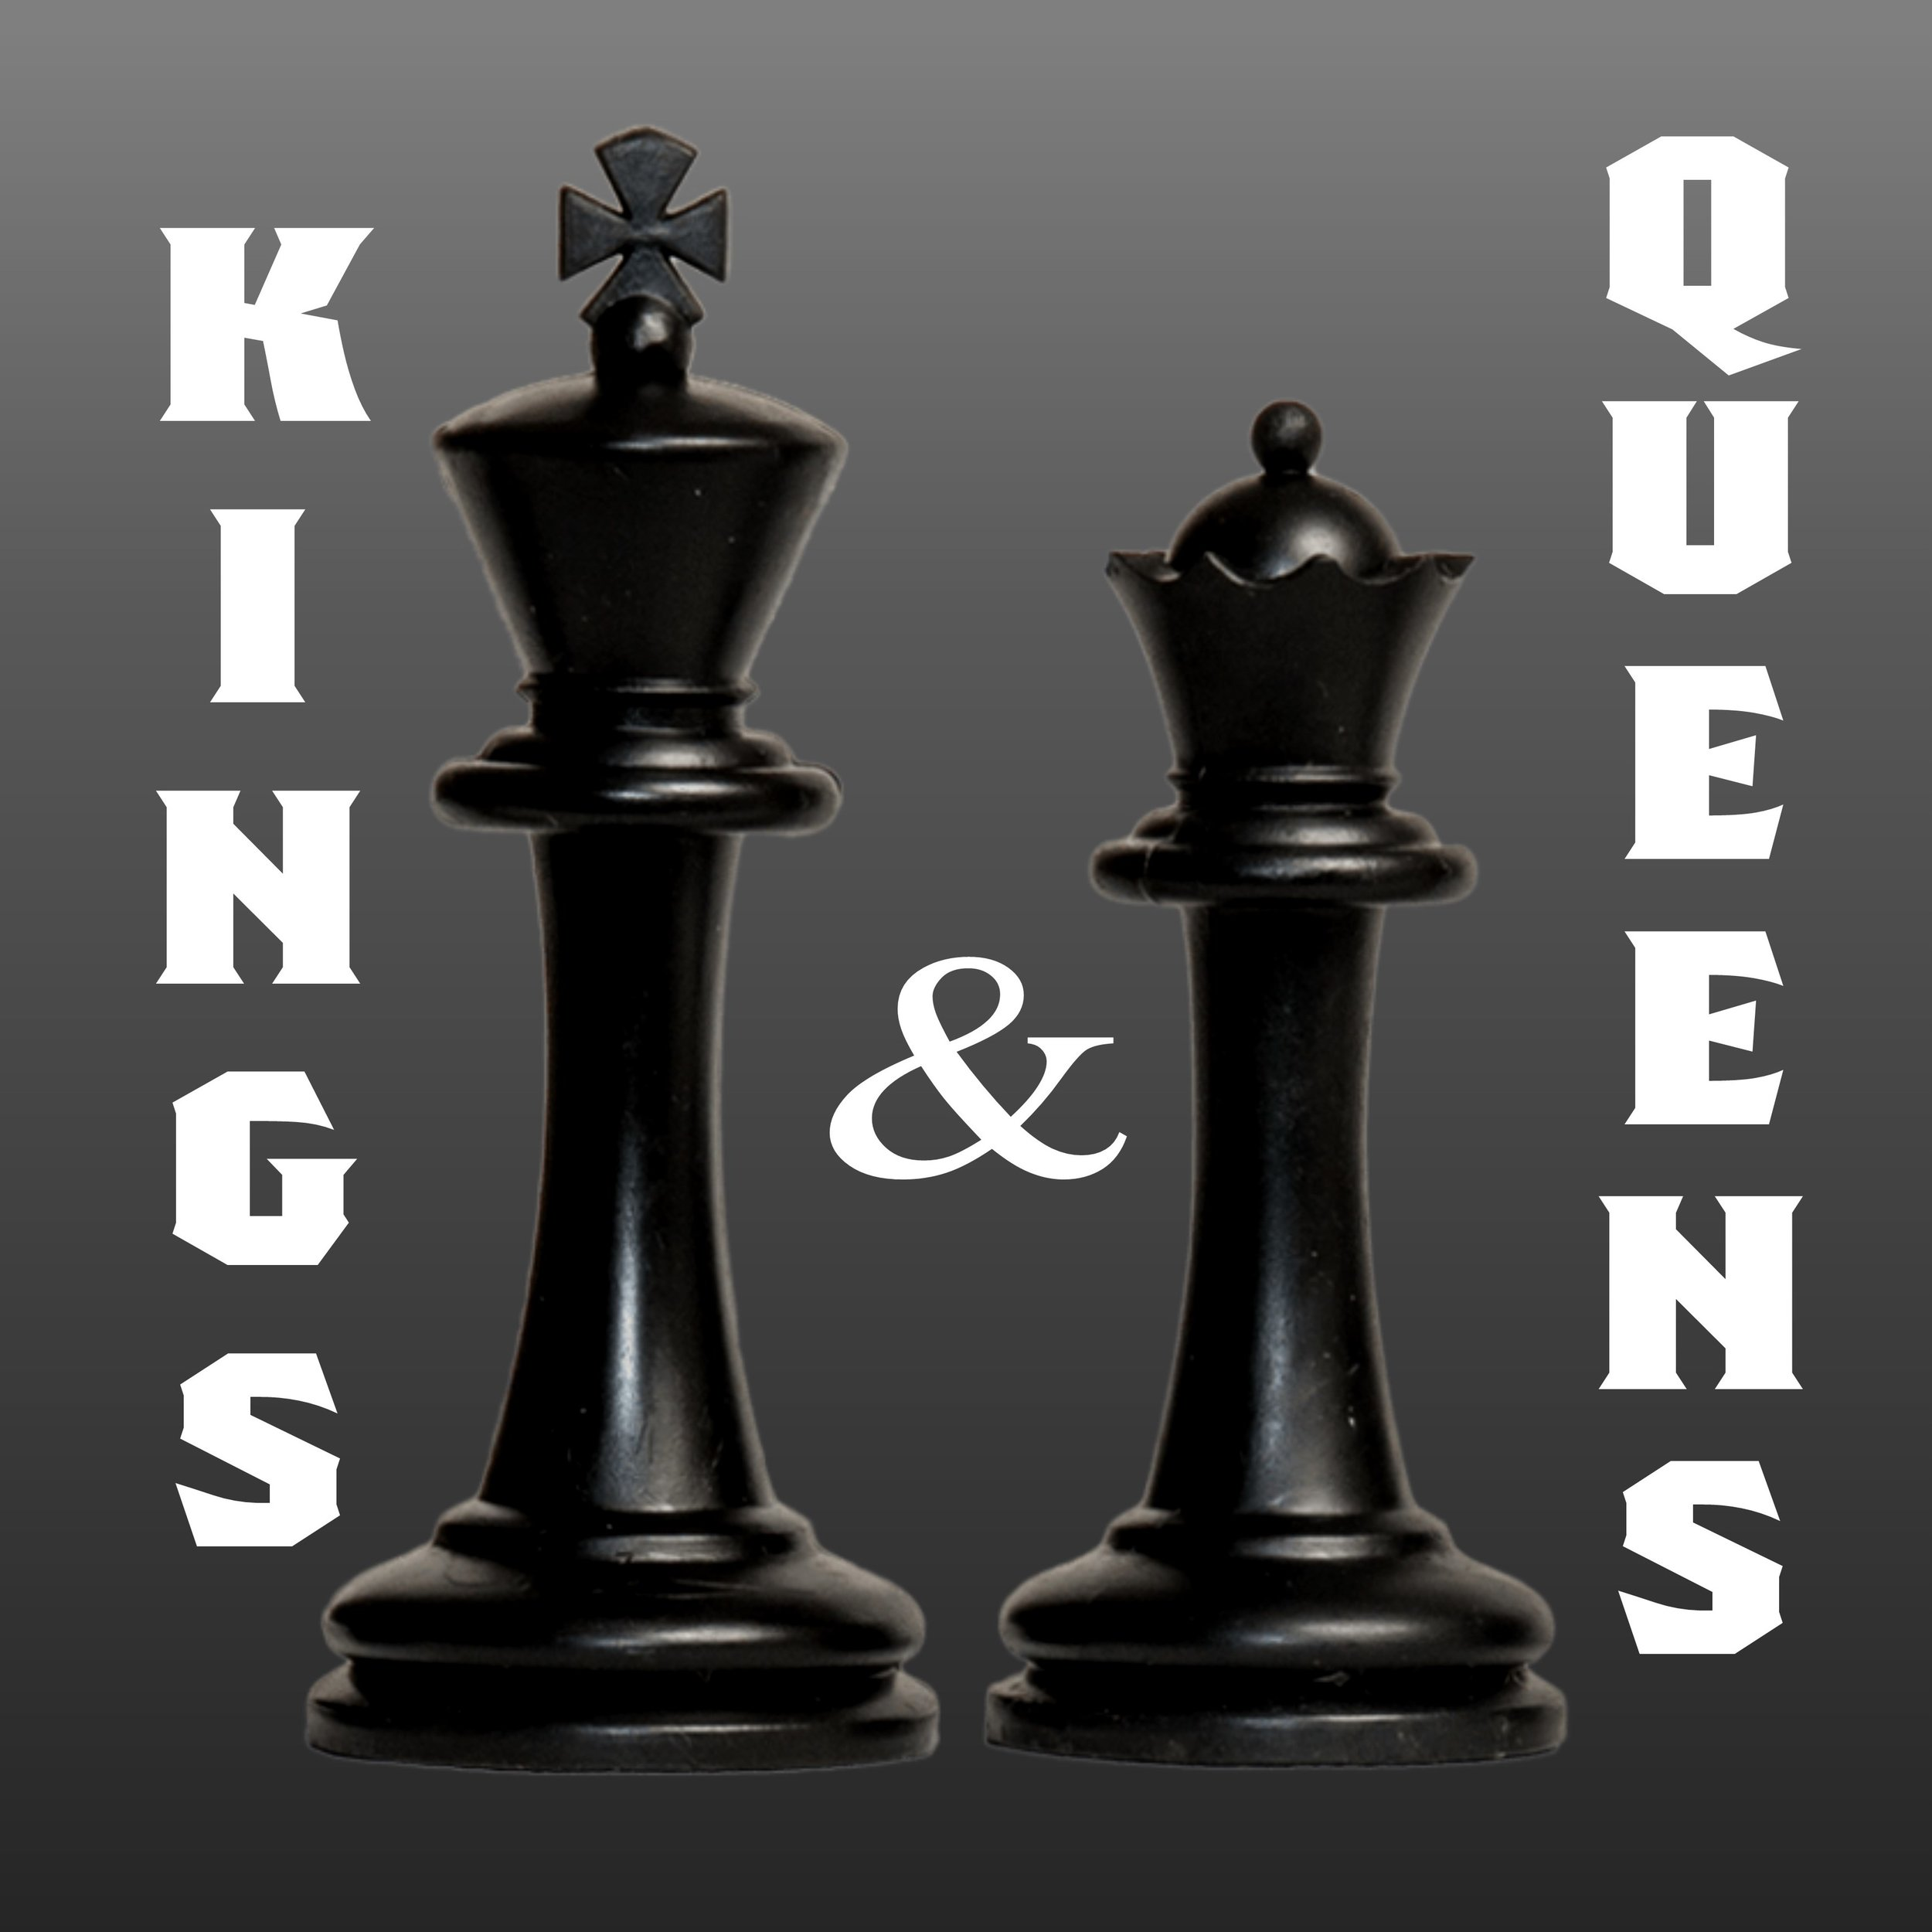 Kings and Queens web image.jpg